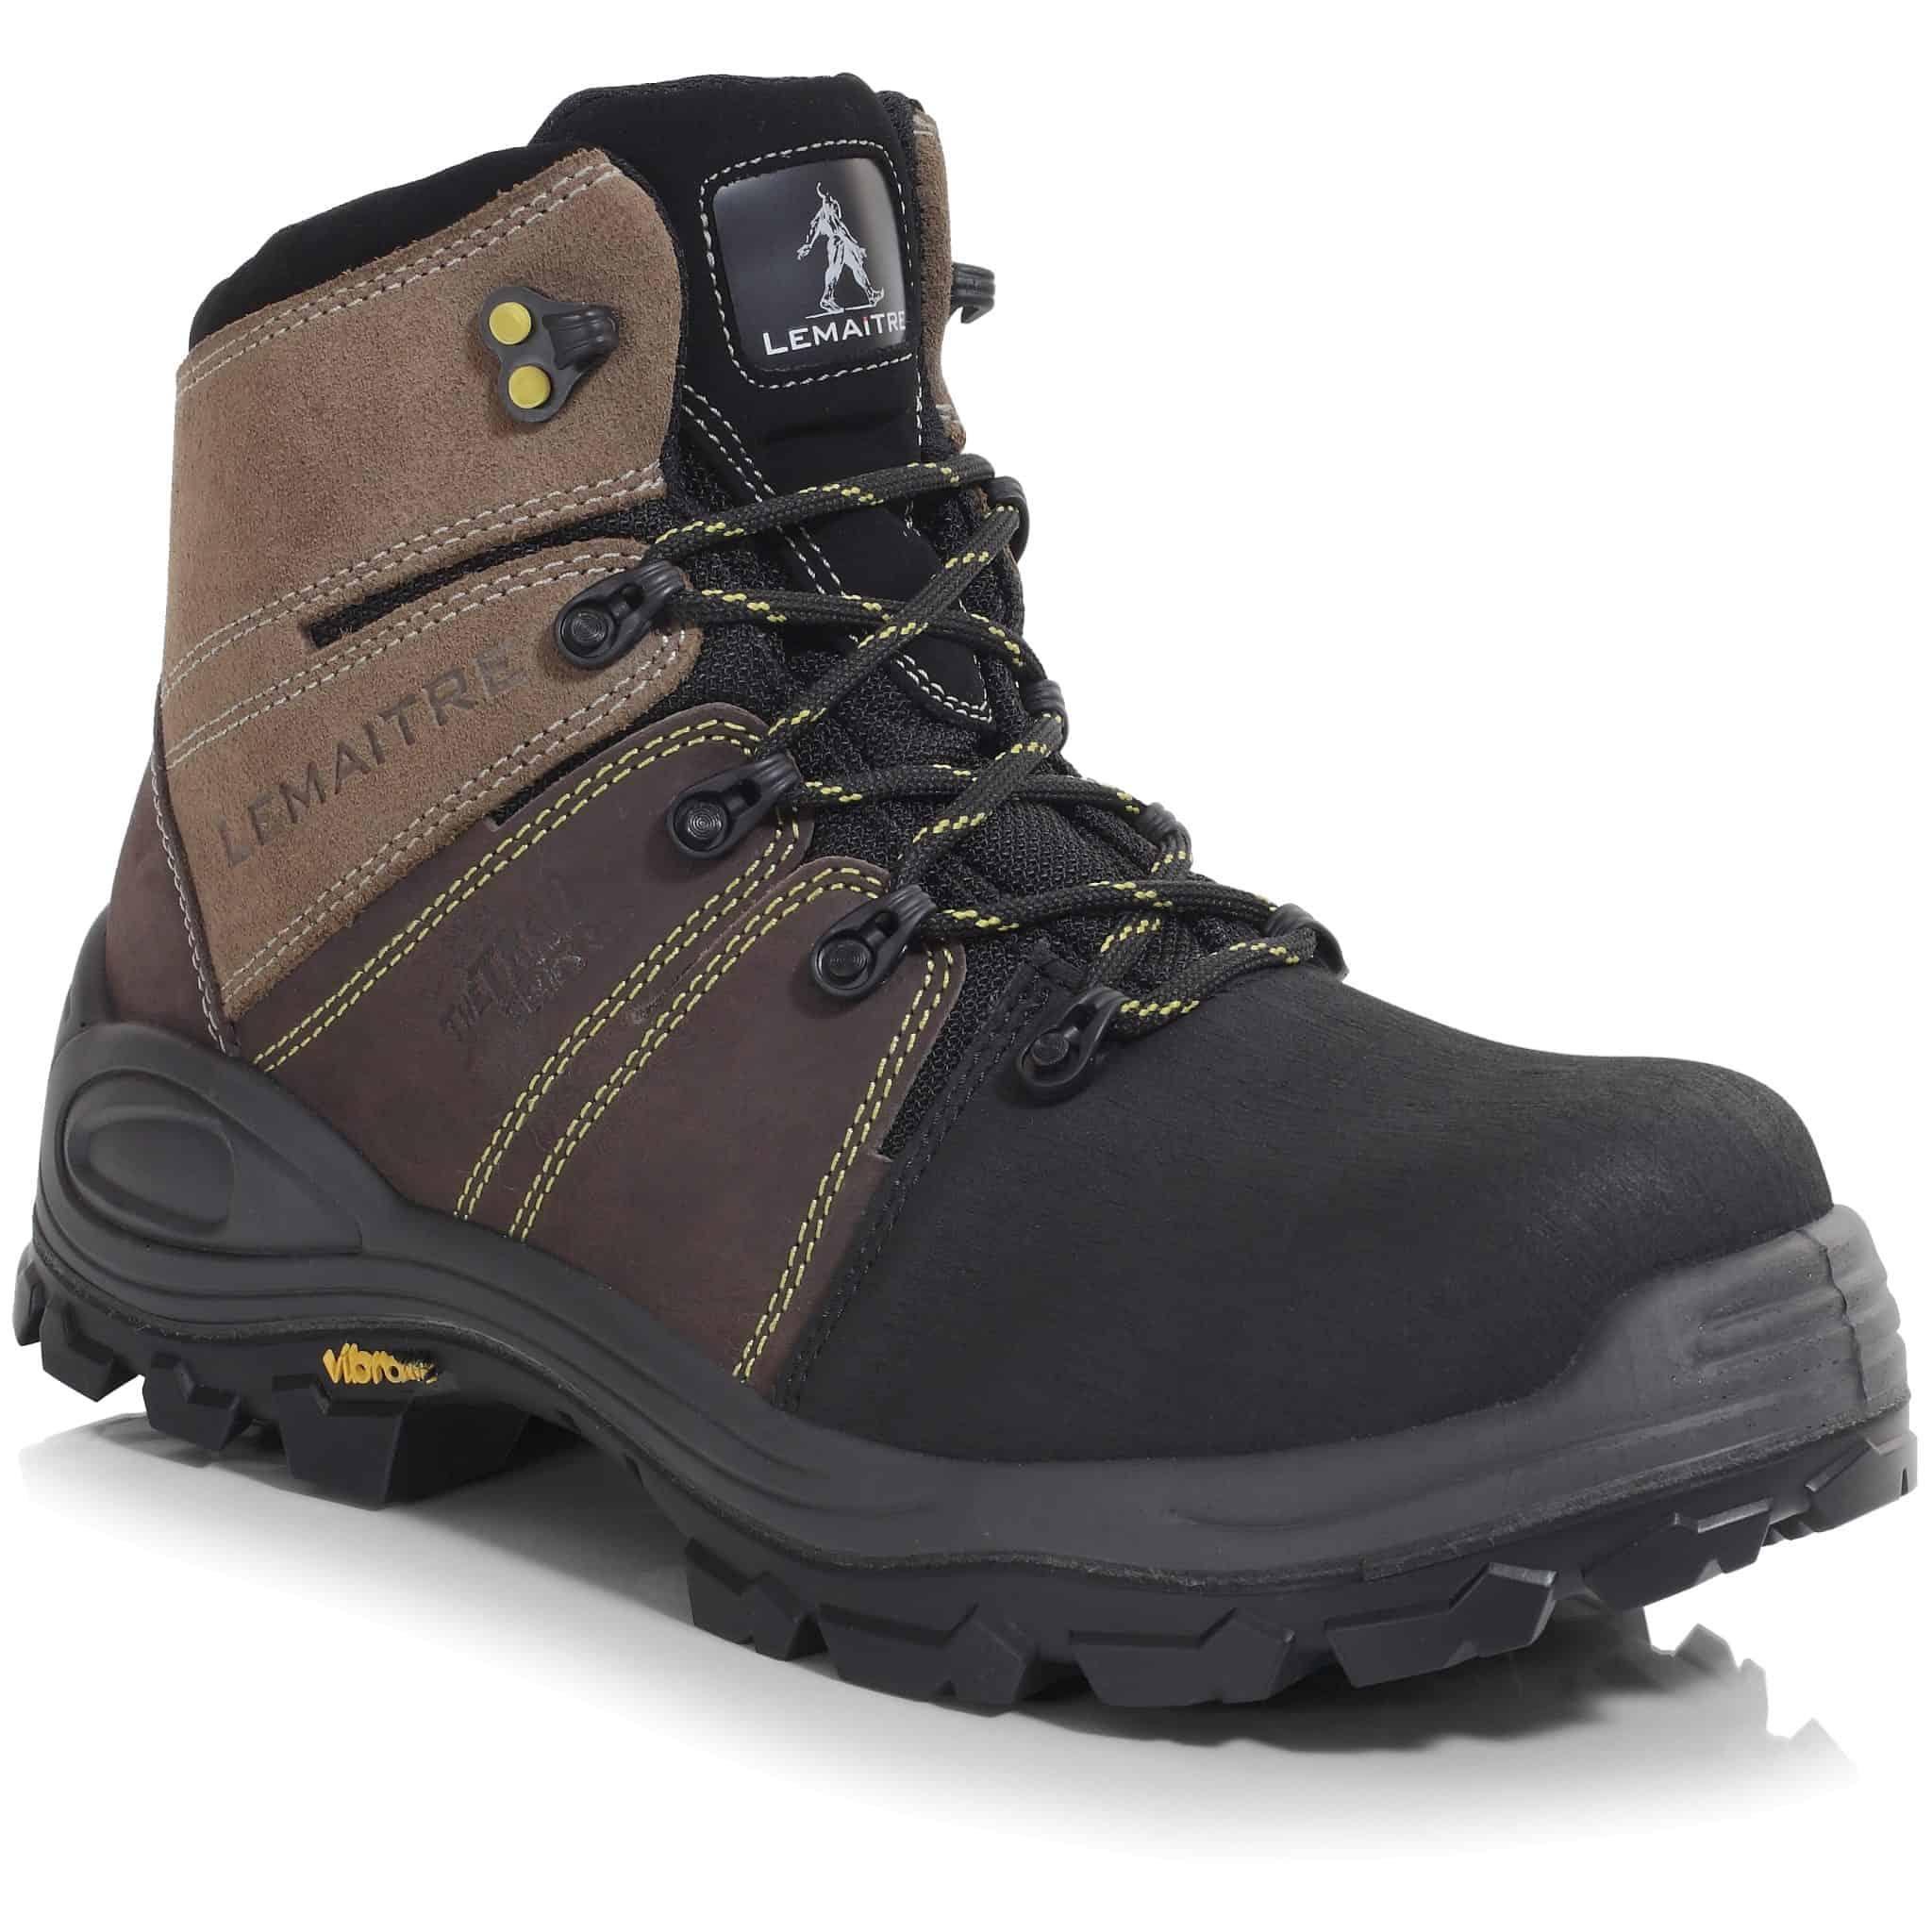 Trek Brun – Lightweight S3 SRC WR PU/Vibram Non-Metal Sympatex Waterproof Safety Hiker Boots